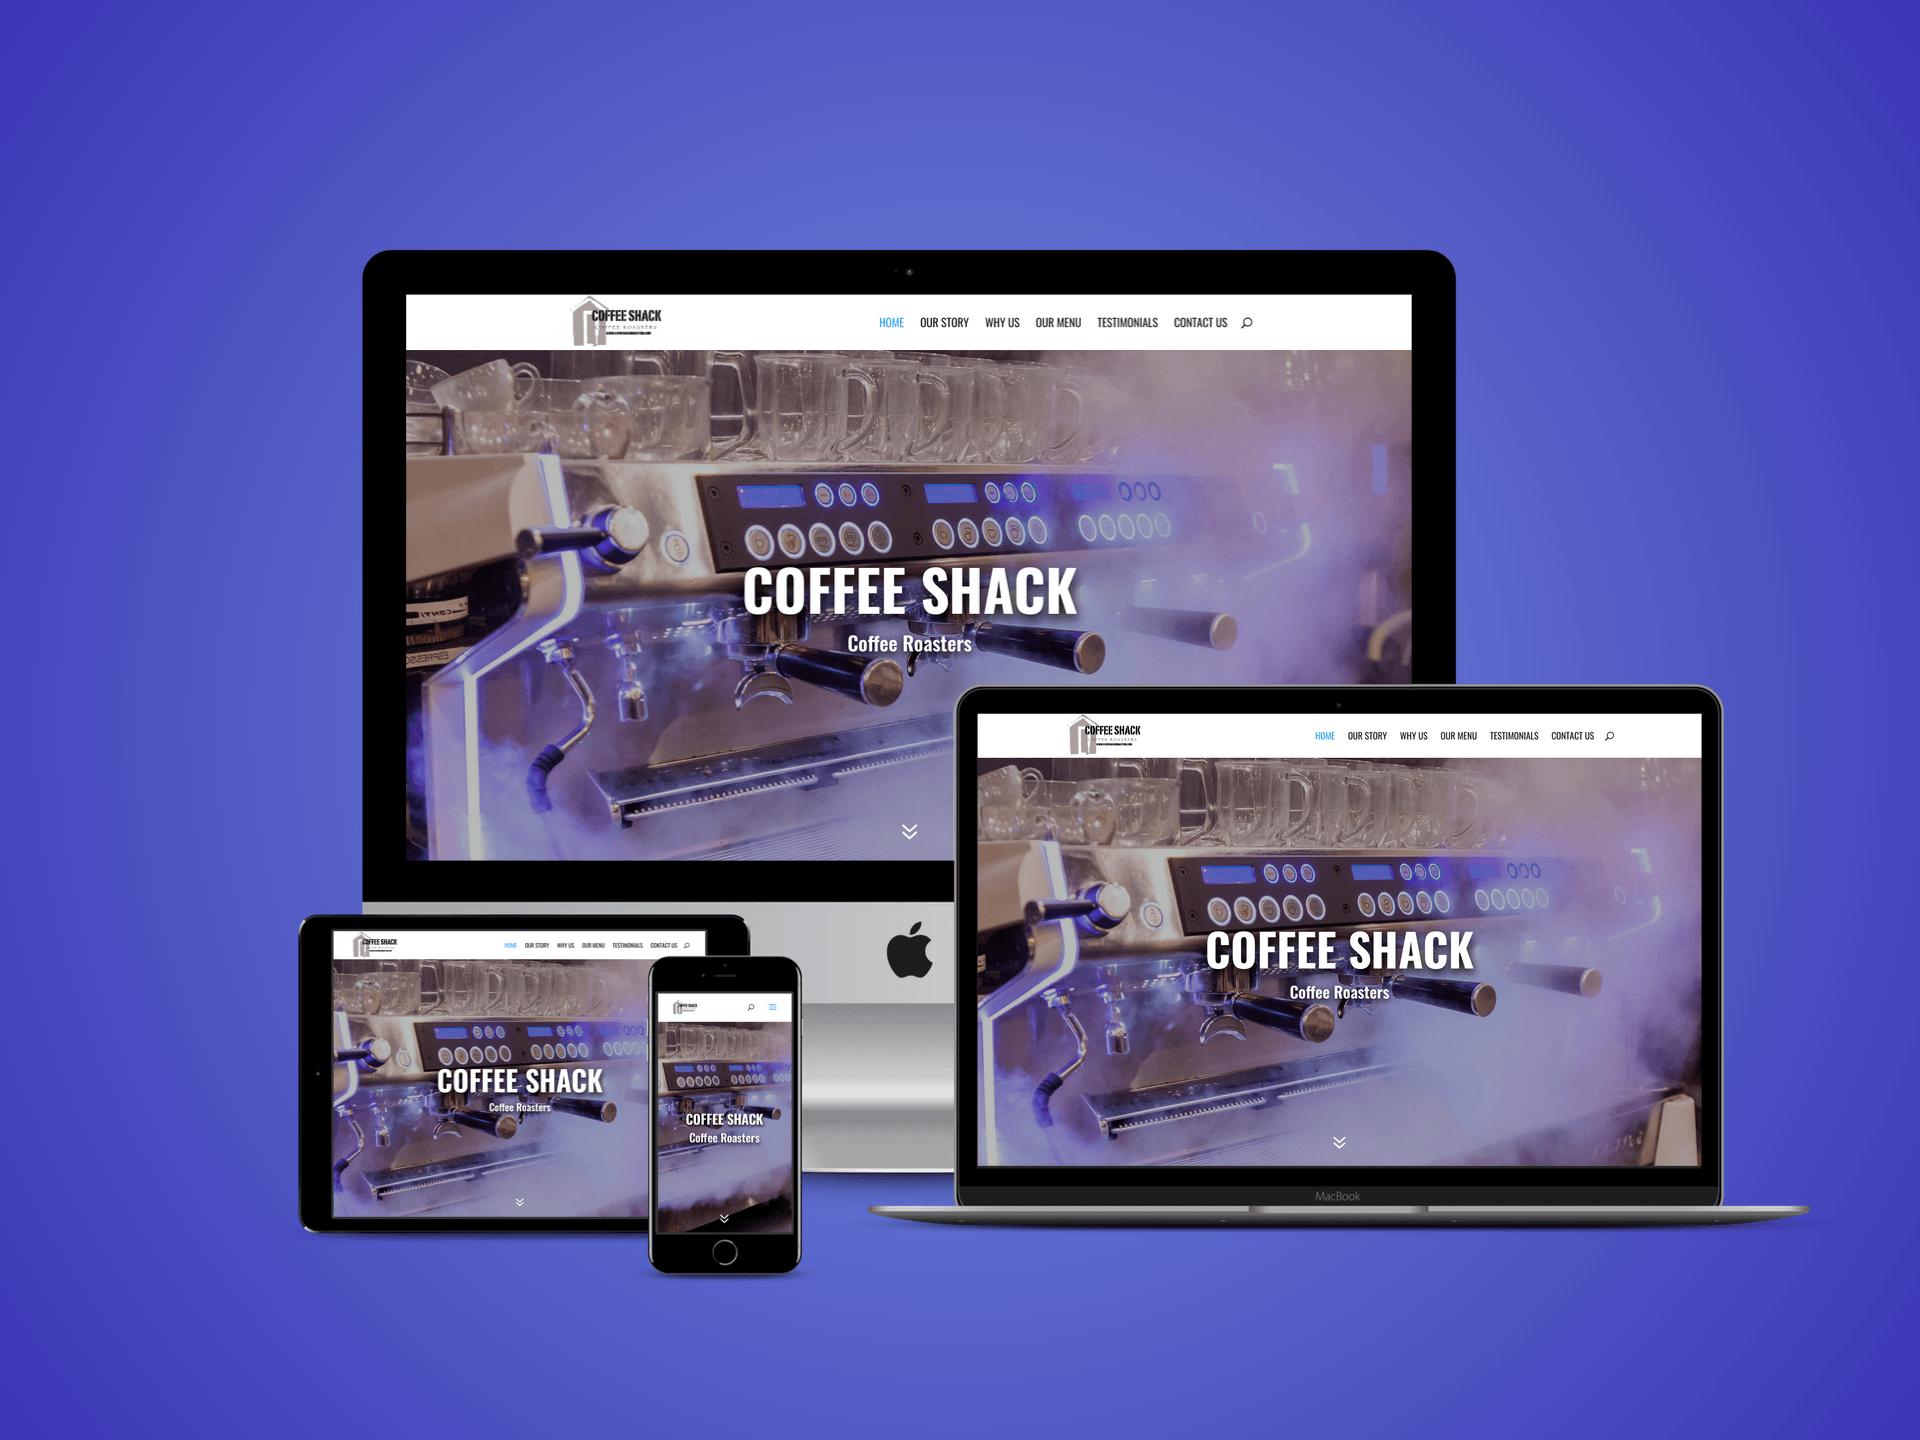 Coffee Shack Coffee Roasters New Website Design